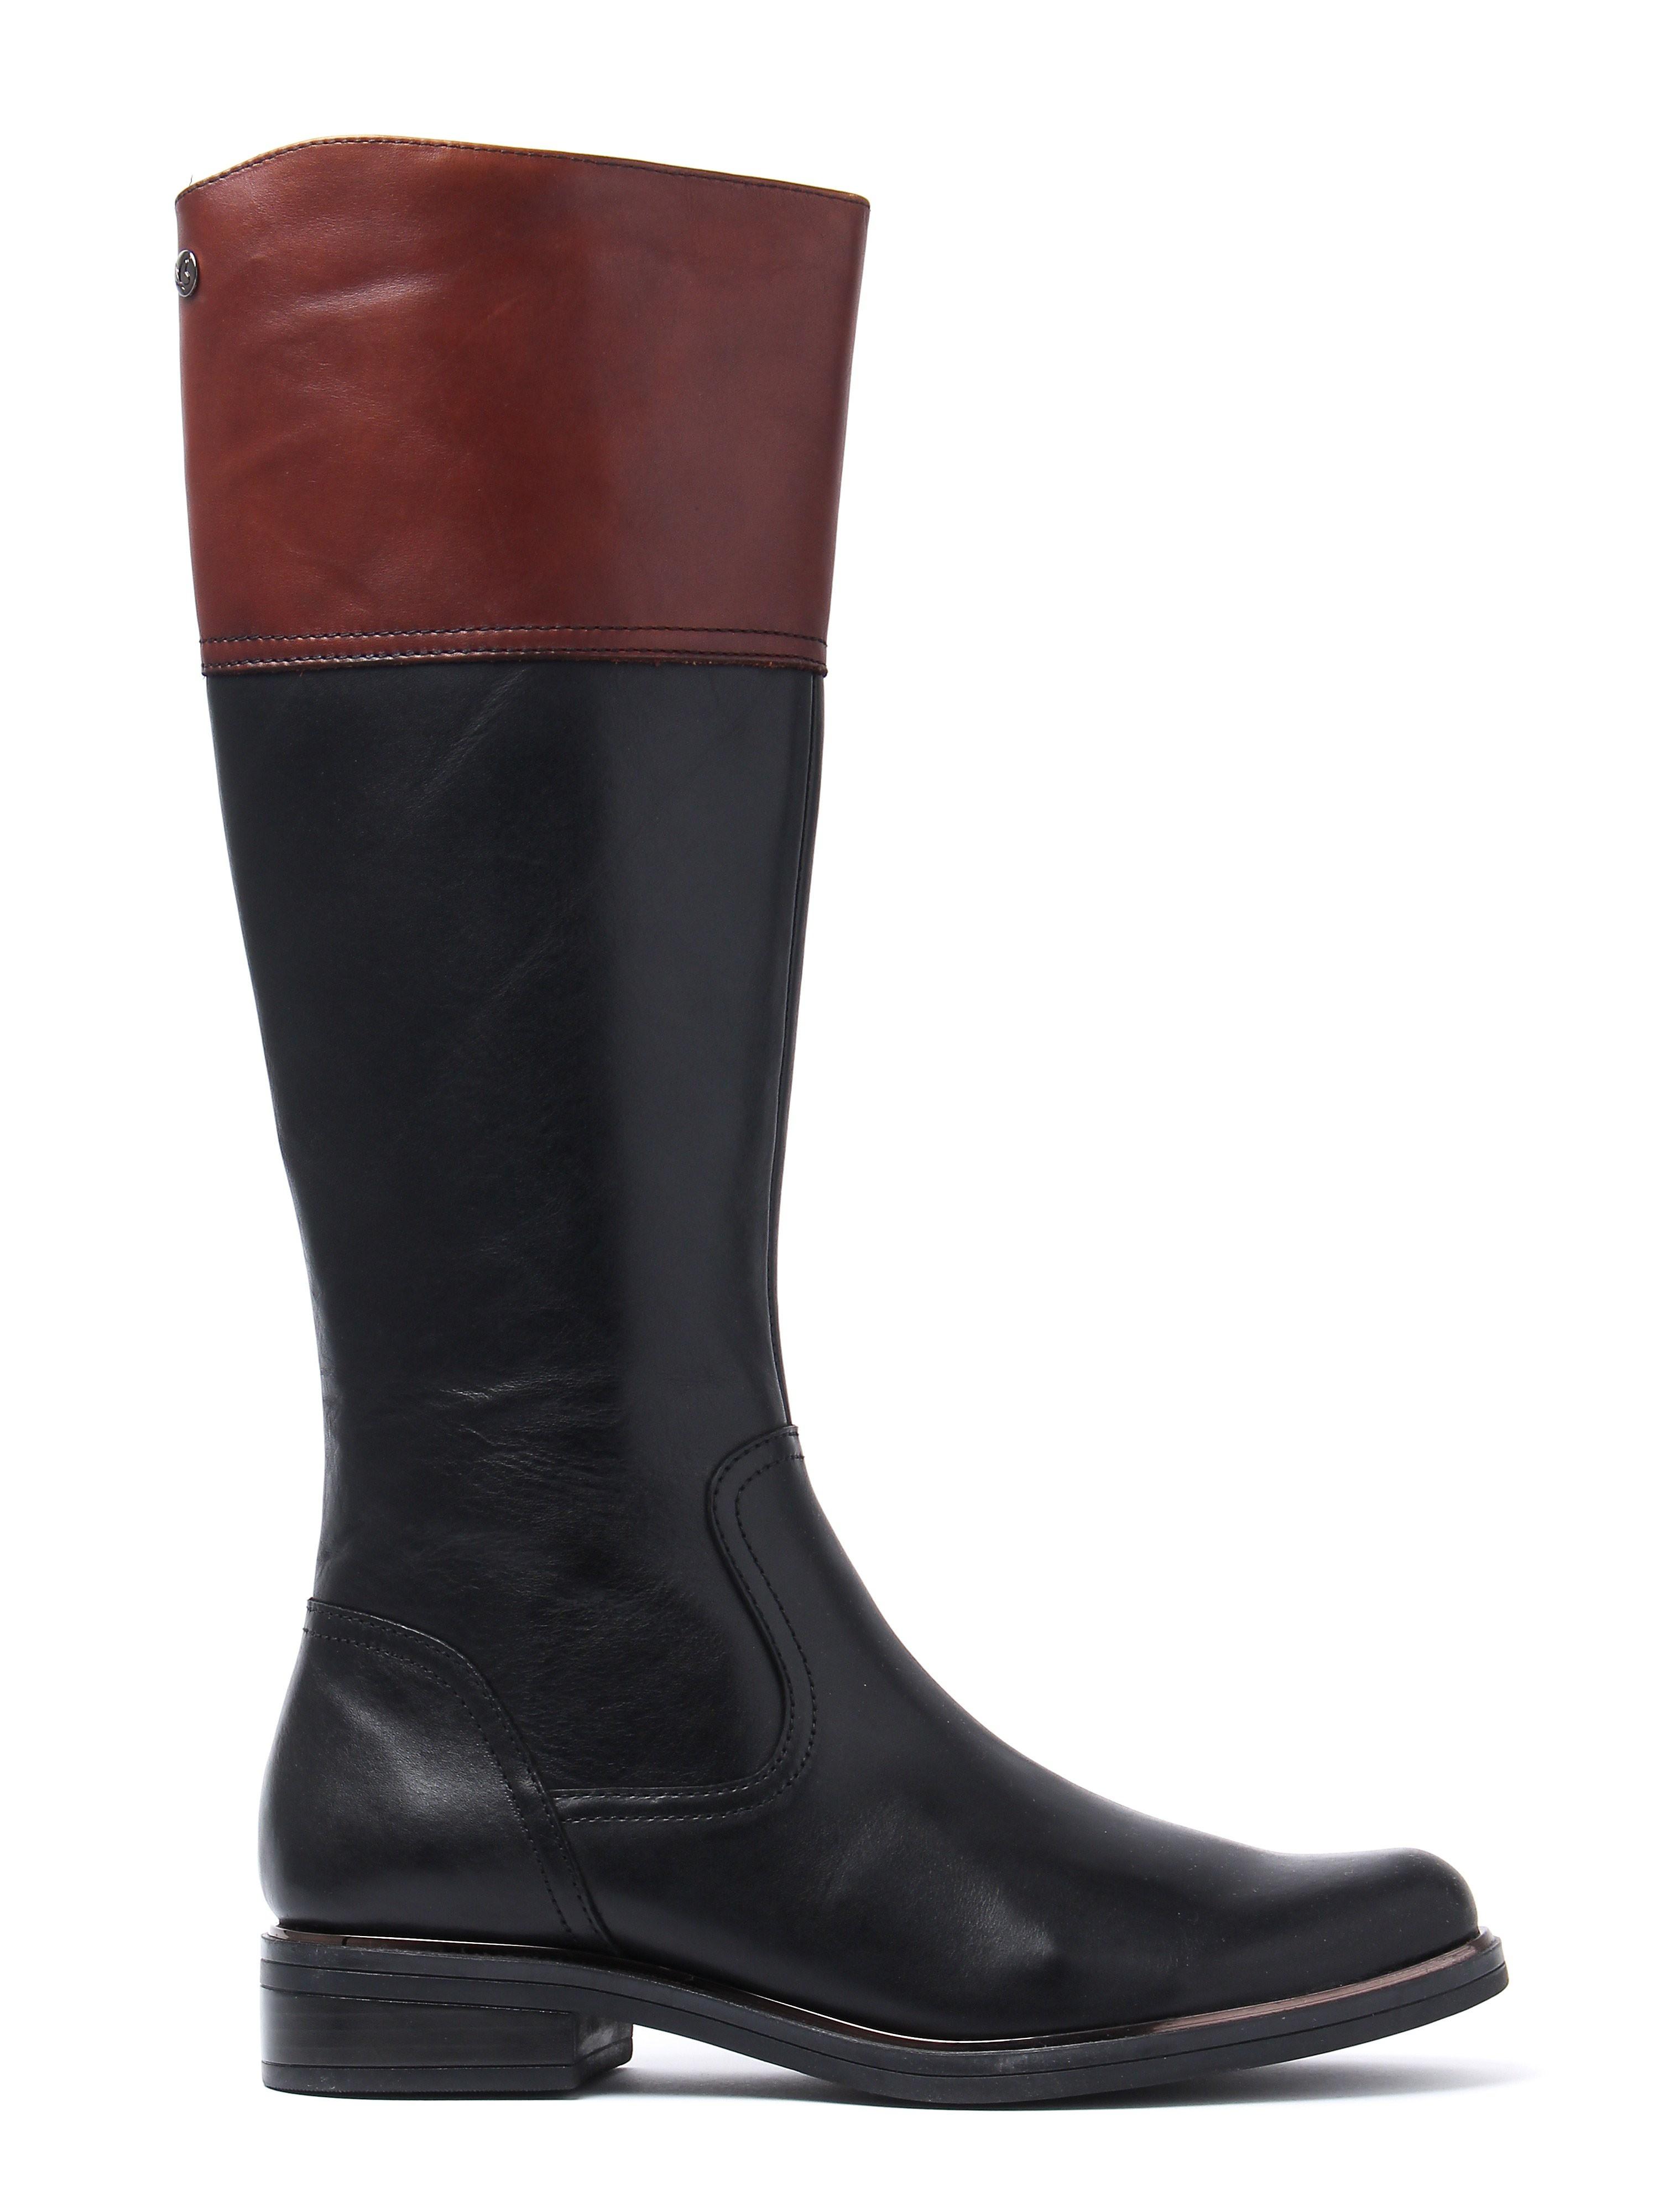 Caprice Women's Tall Combi Boots - Black & Cognac Leather